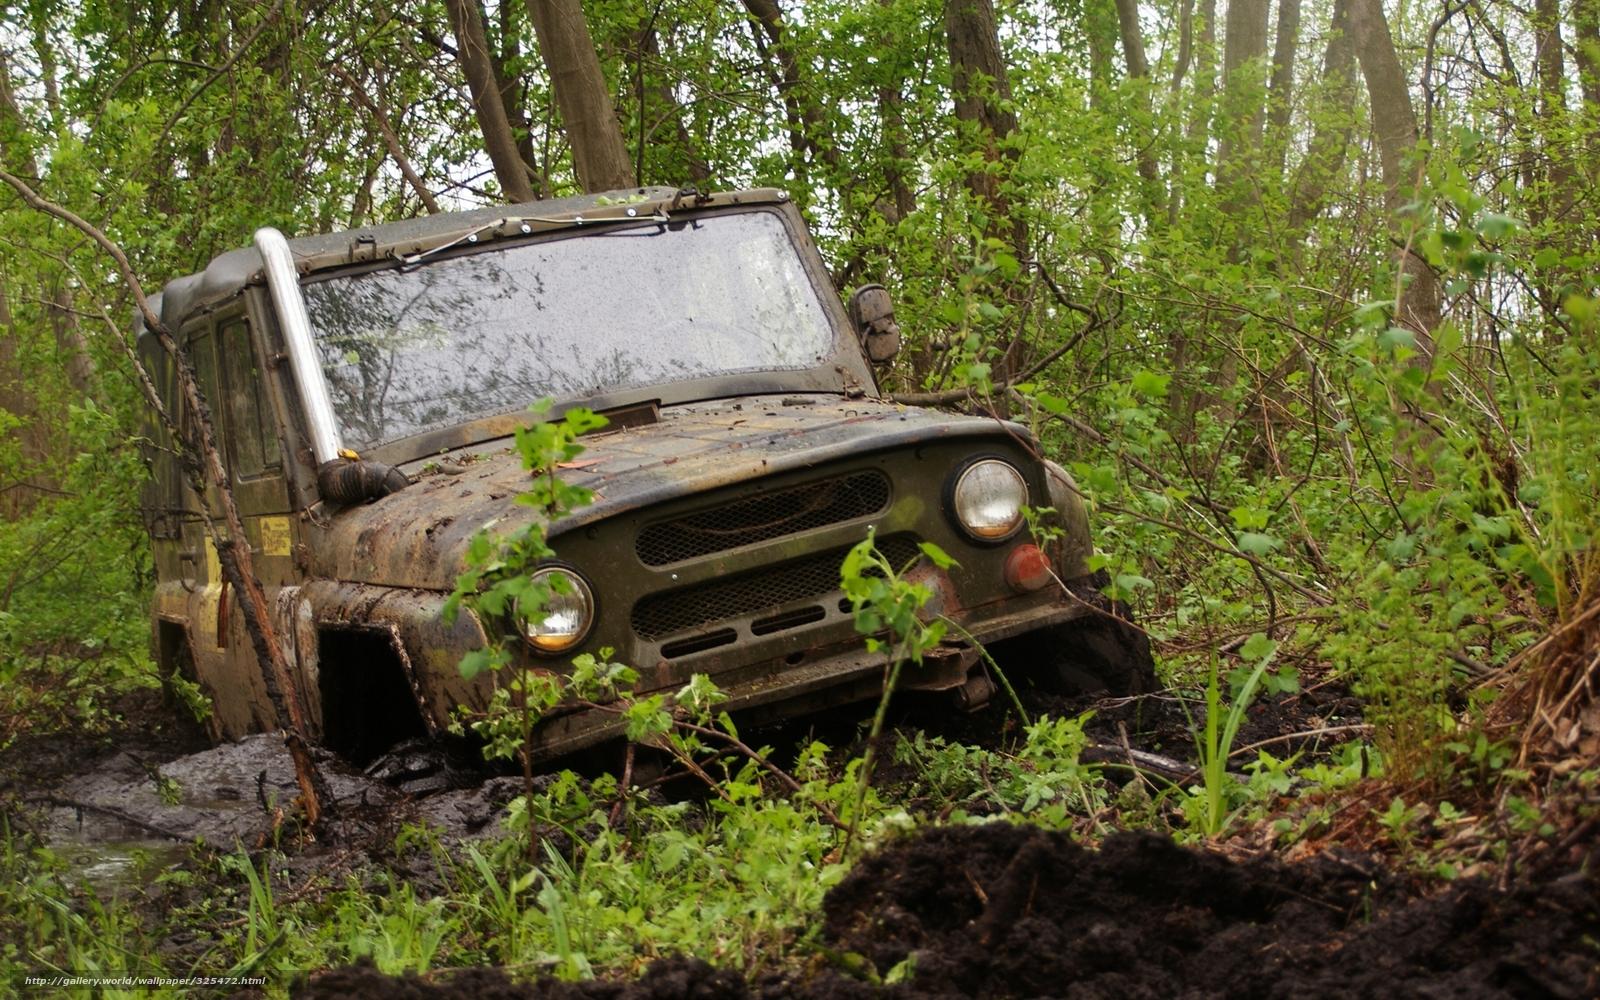 Mud Truck 1920 : Pobra tapety offroad gry brud darmowe na pulpit